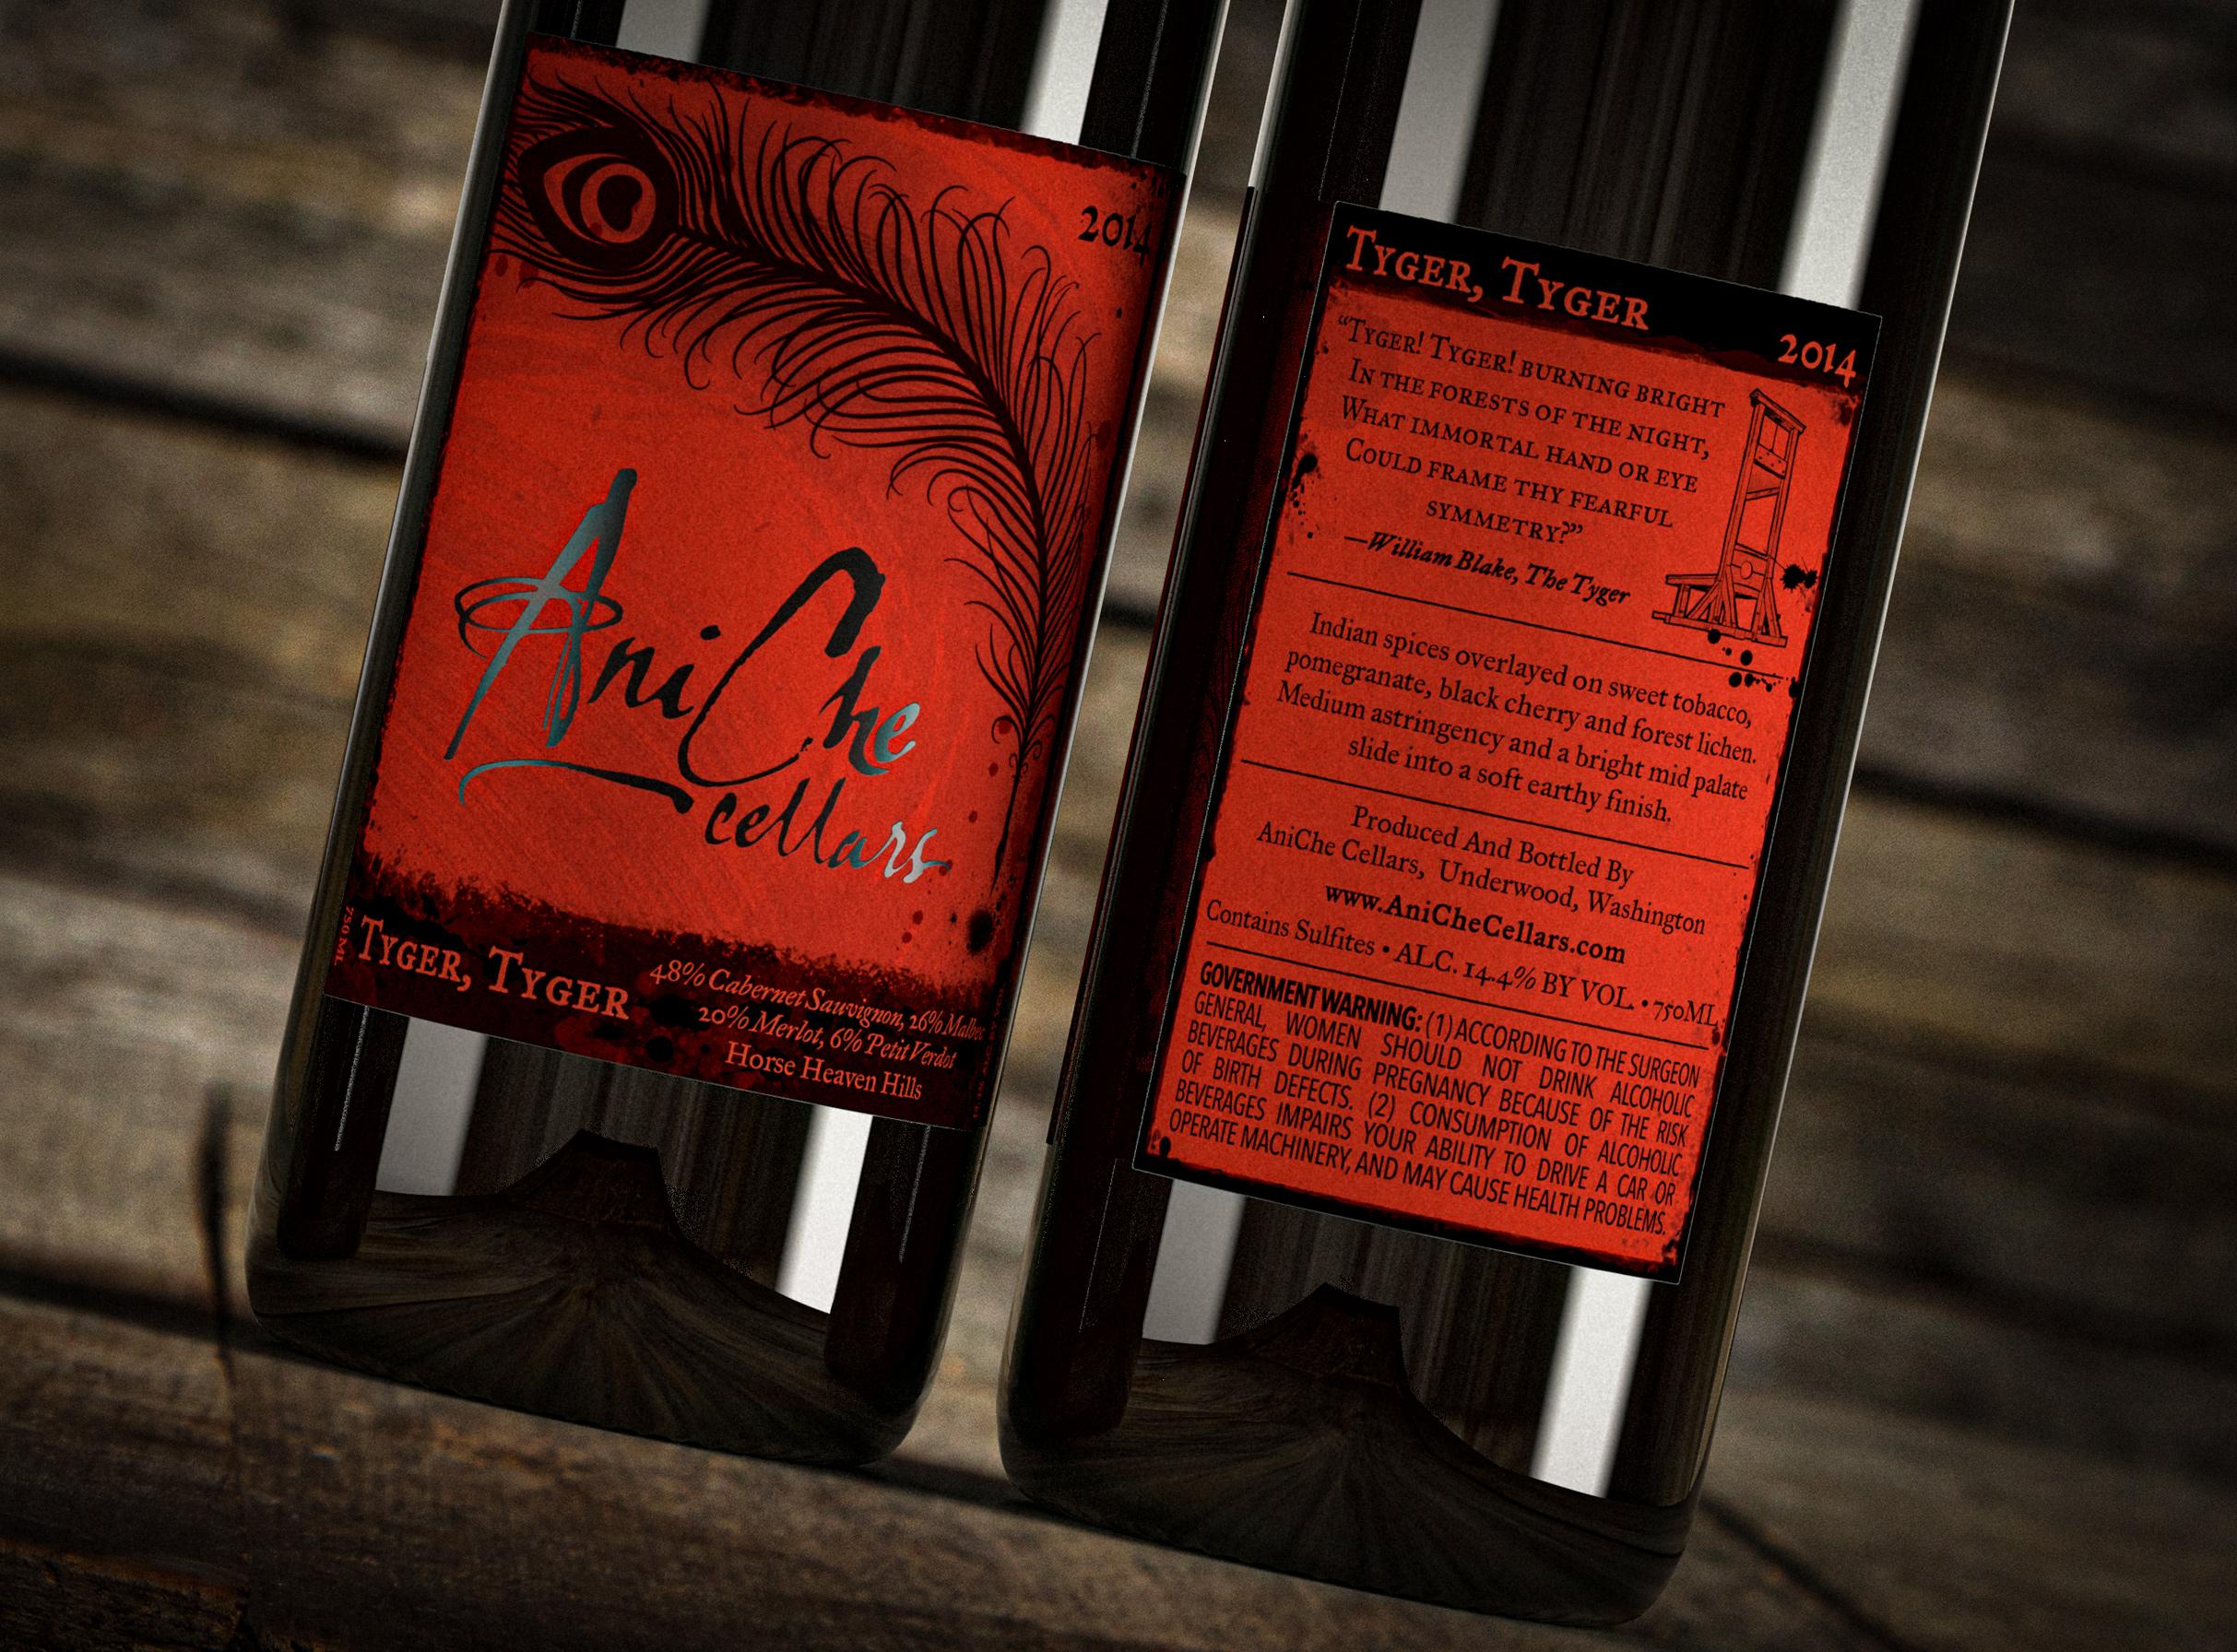 *Aniche Cellars -Original Labels